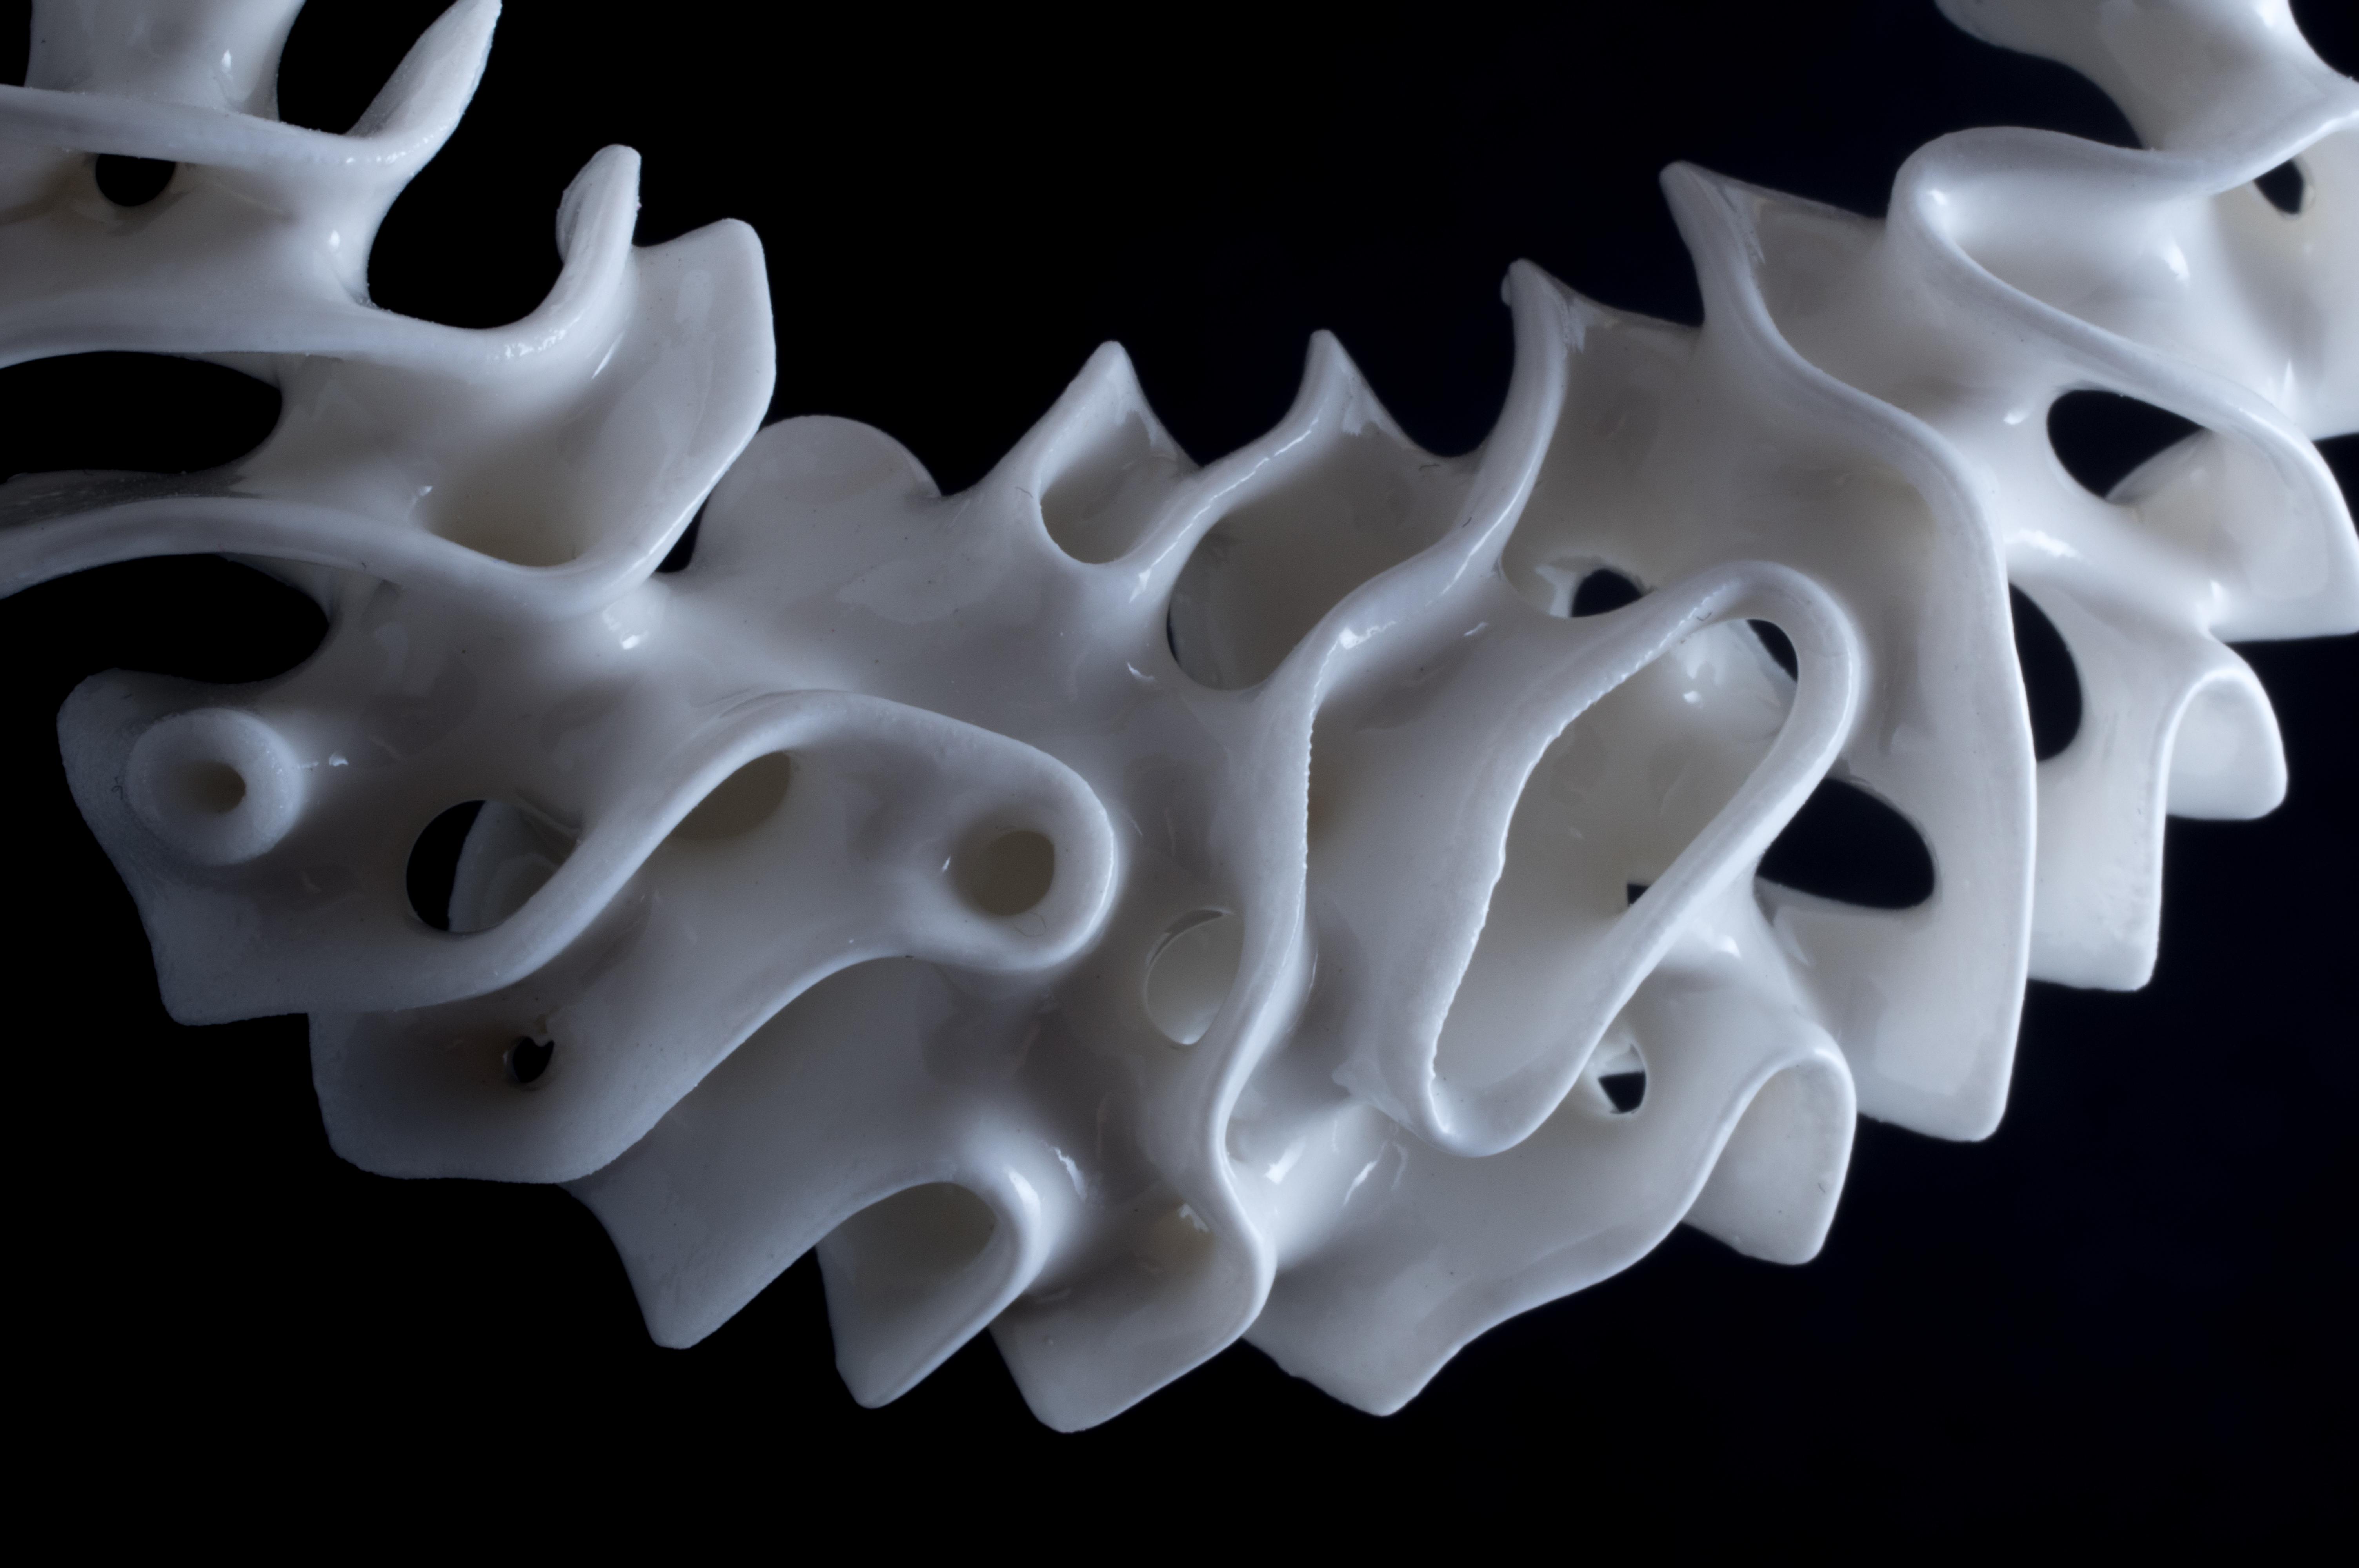 Porifera – 3D printed ceramic jewelry | Nervous System blog